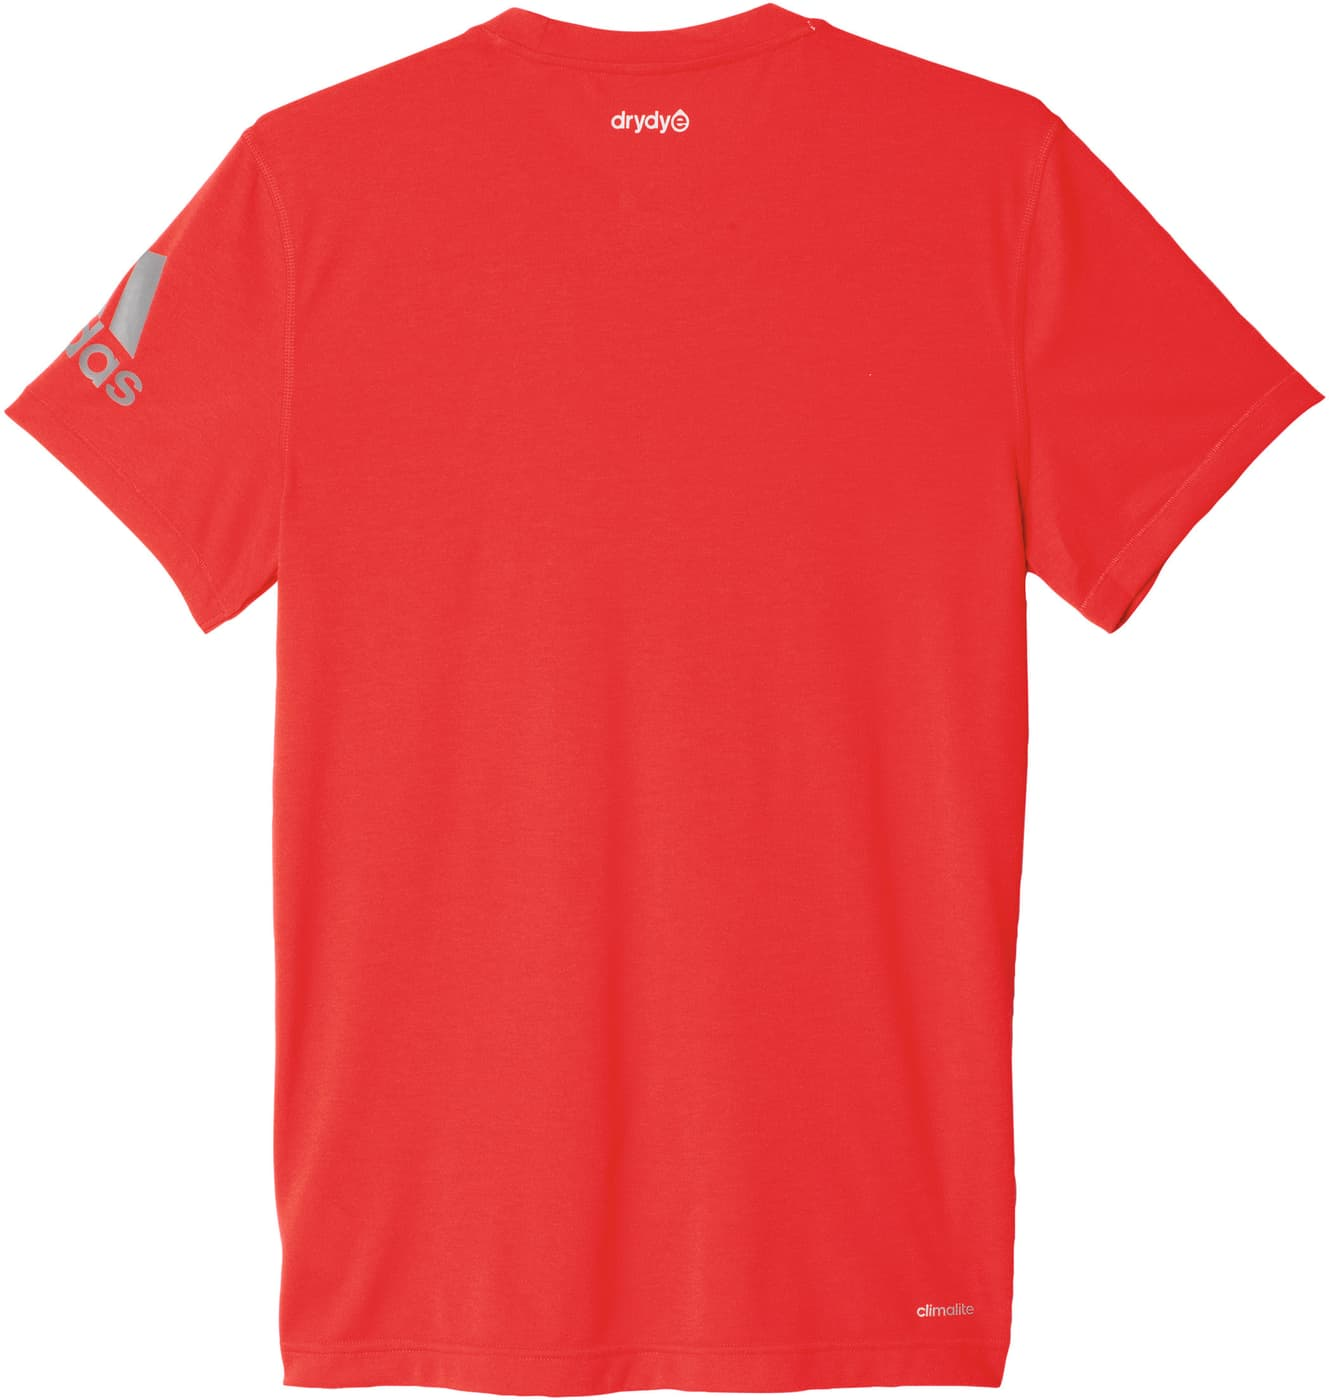 Adidas herren t shirt prime tee dd migros for Adidas custom t shirts